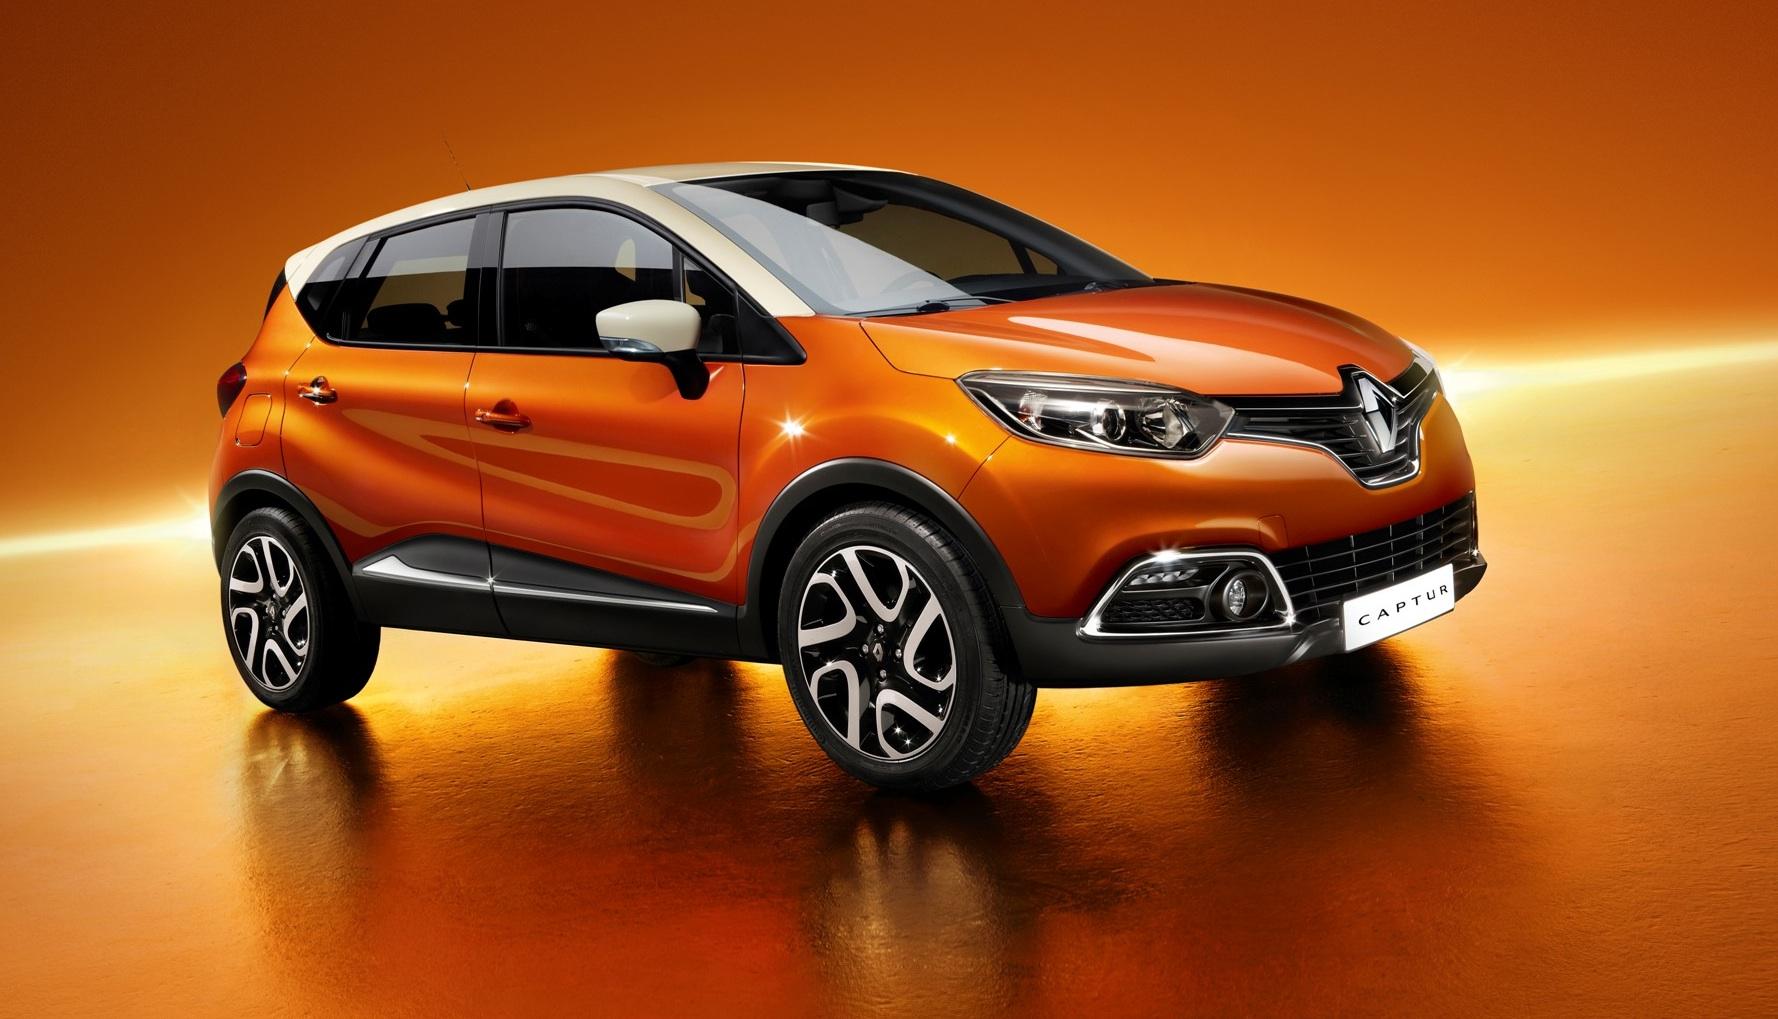 Renault Captur 2014 Interior Renault Captur 2014